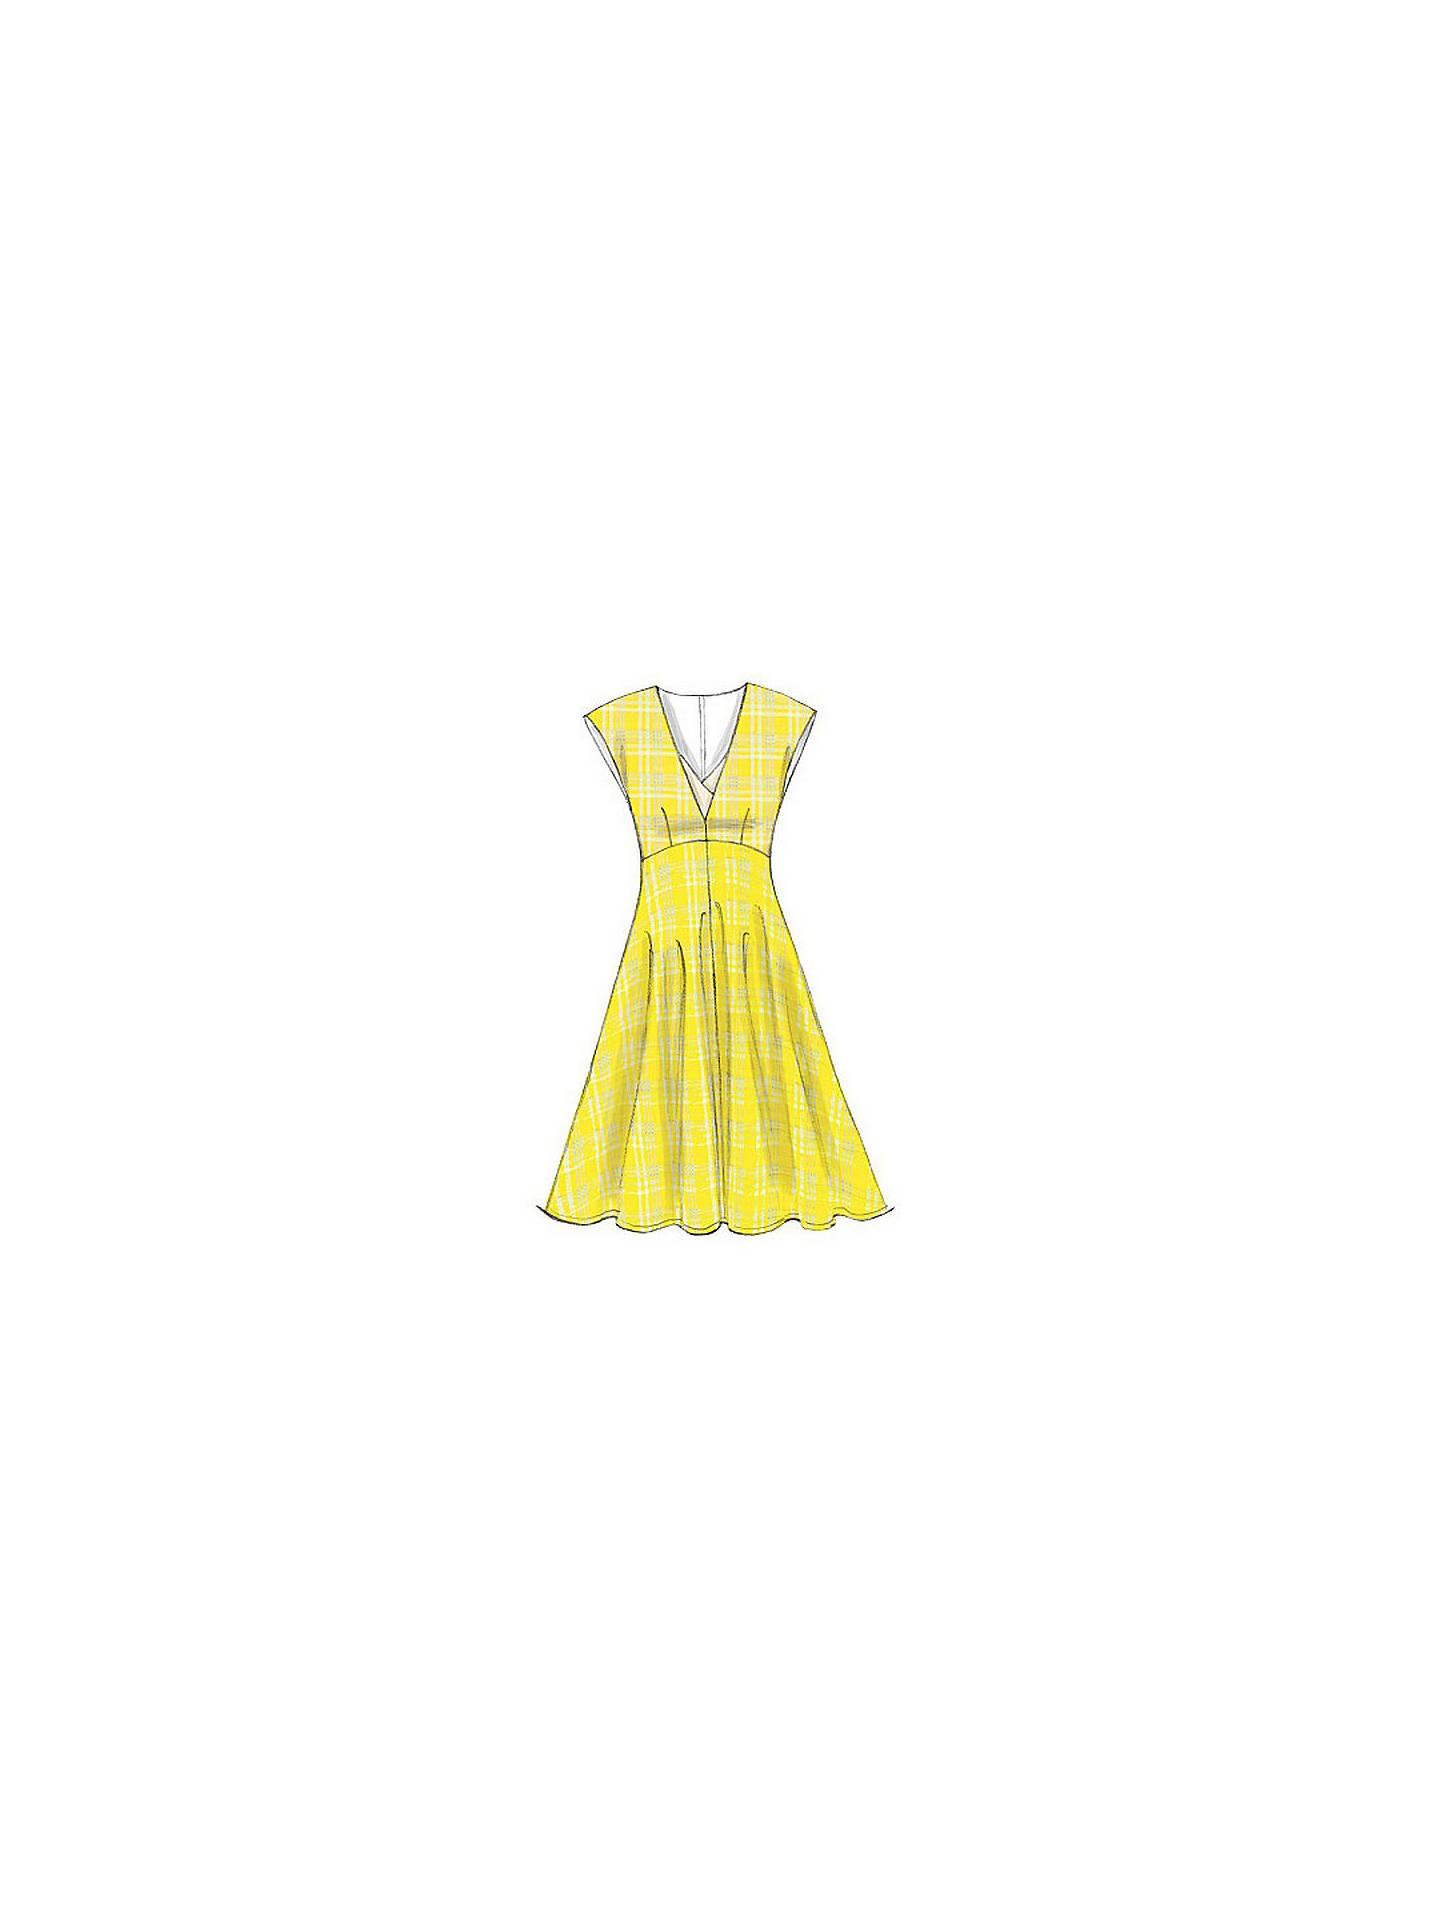 Vogue Women\'s Cap Sleeve Midi Dress Sewing Pattern, 9103 at John ...